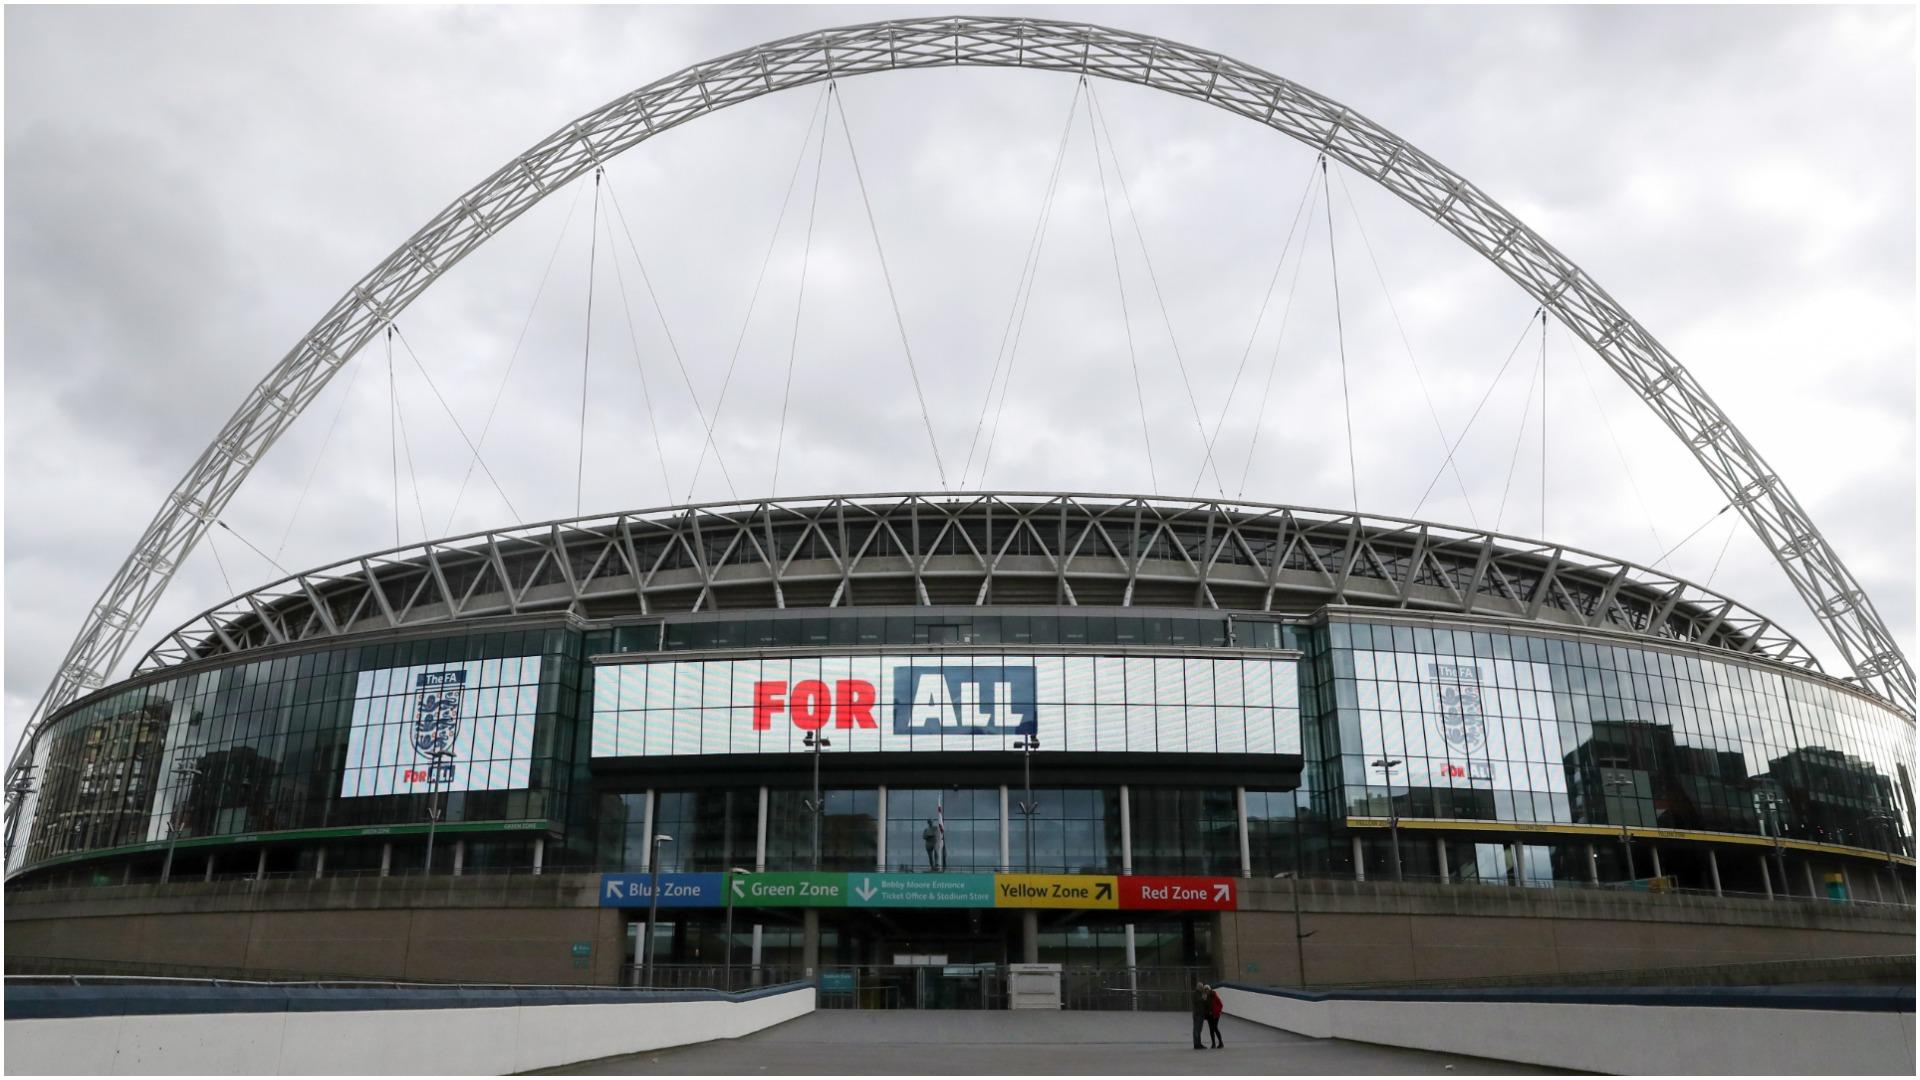 Coronavirus: FA announces 82 redundancies as it braces for loss of £300m